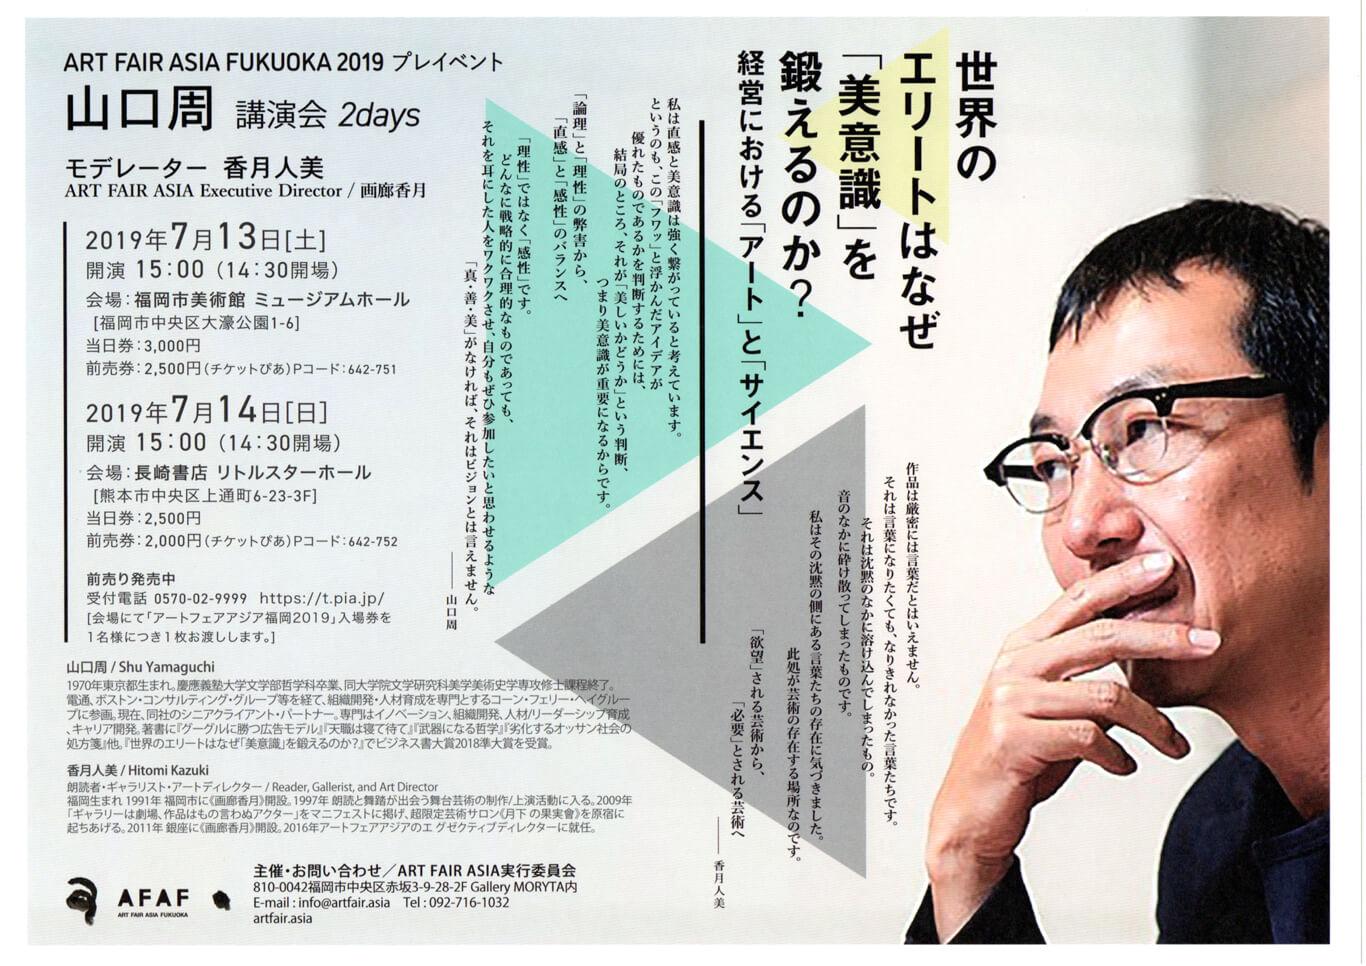 fam-201907-山口周-講演会